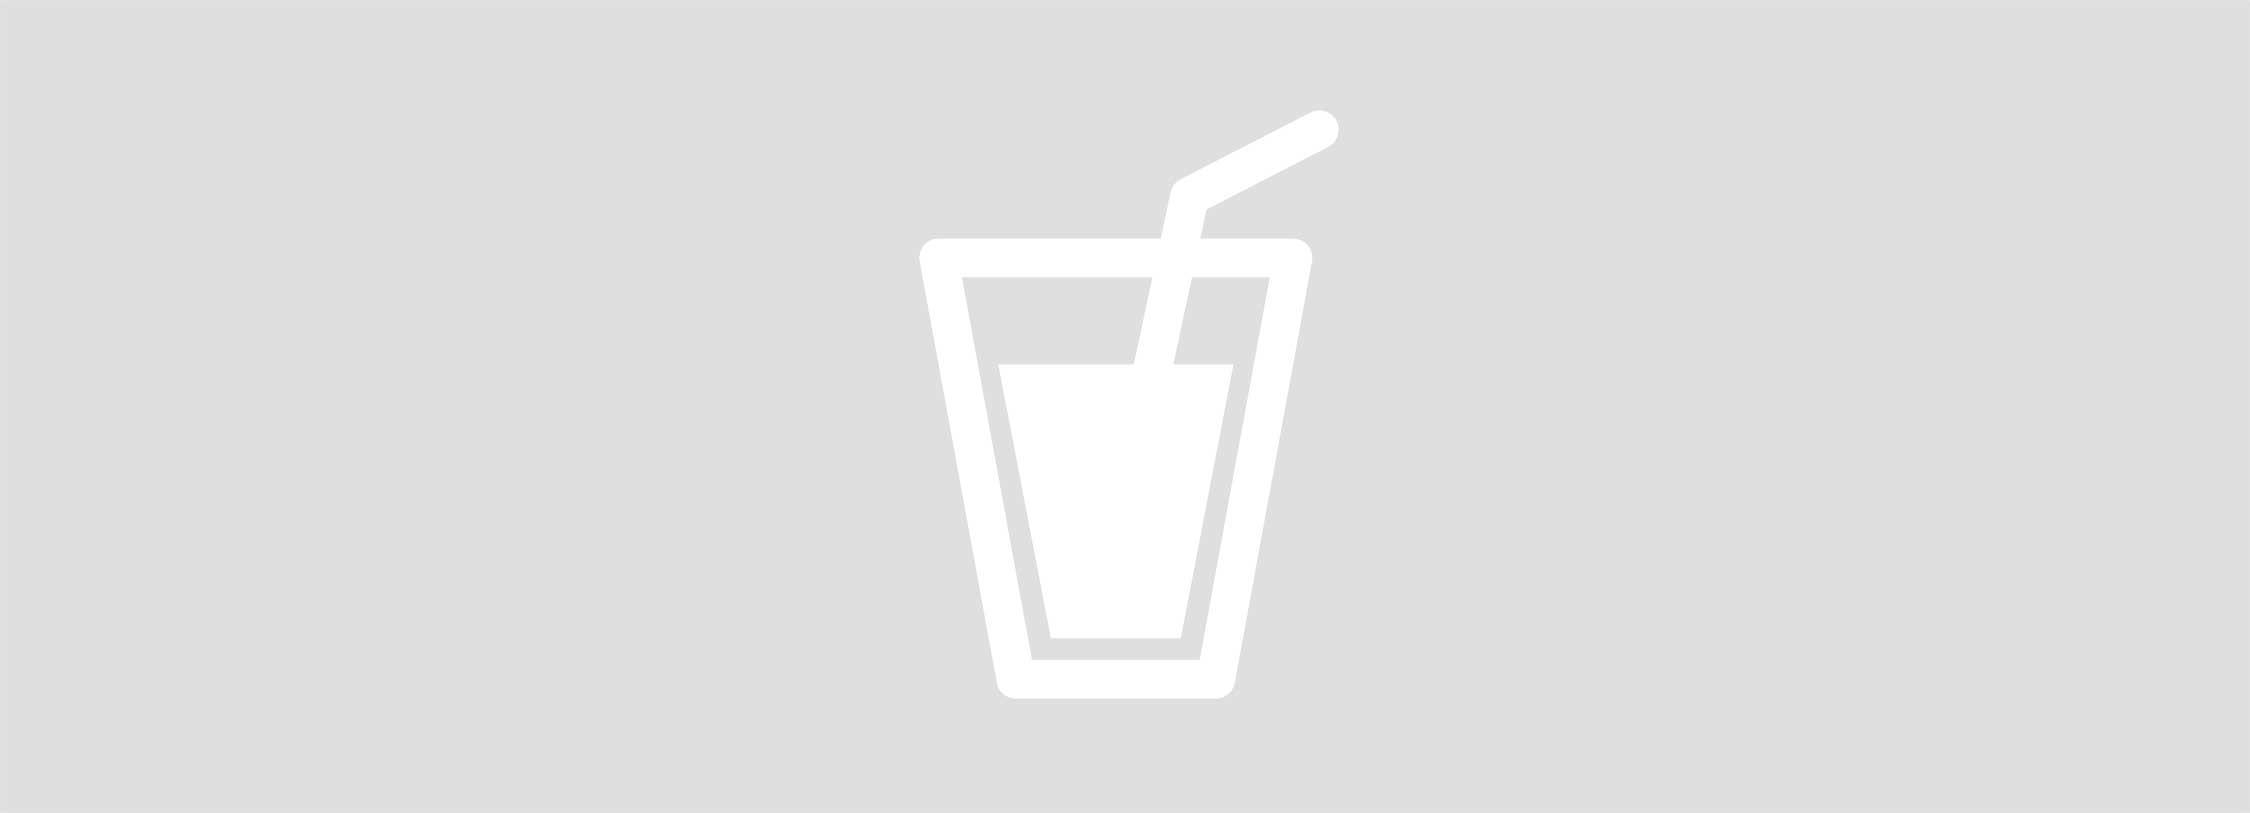 How to choose CBD Drinks